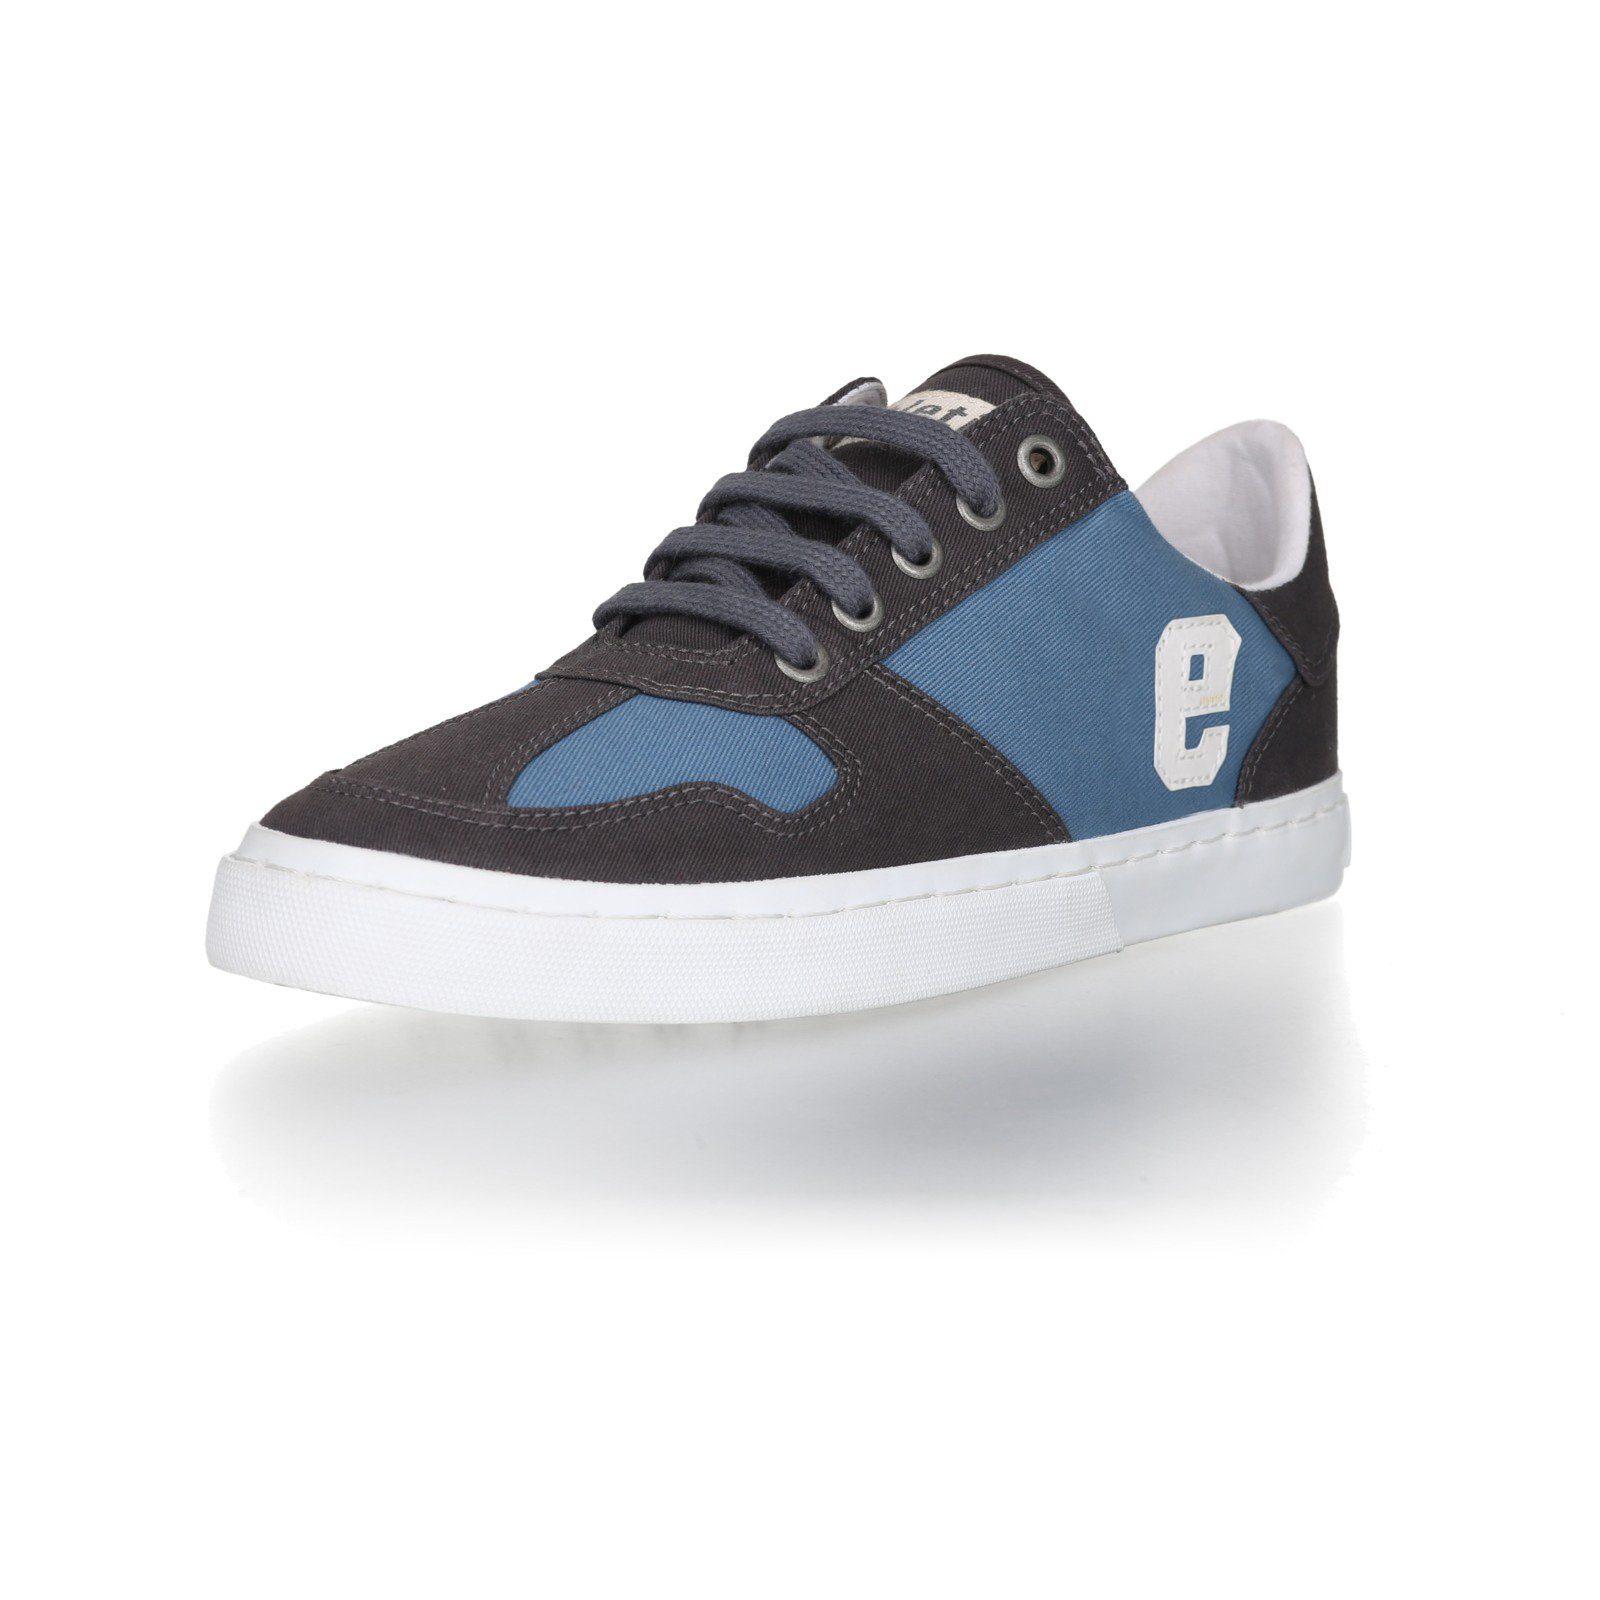 ETHLETIC Sneaker aus fairen Bedingungen Root18  Rainy Sea